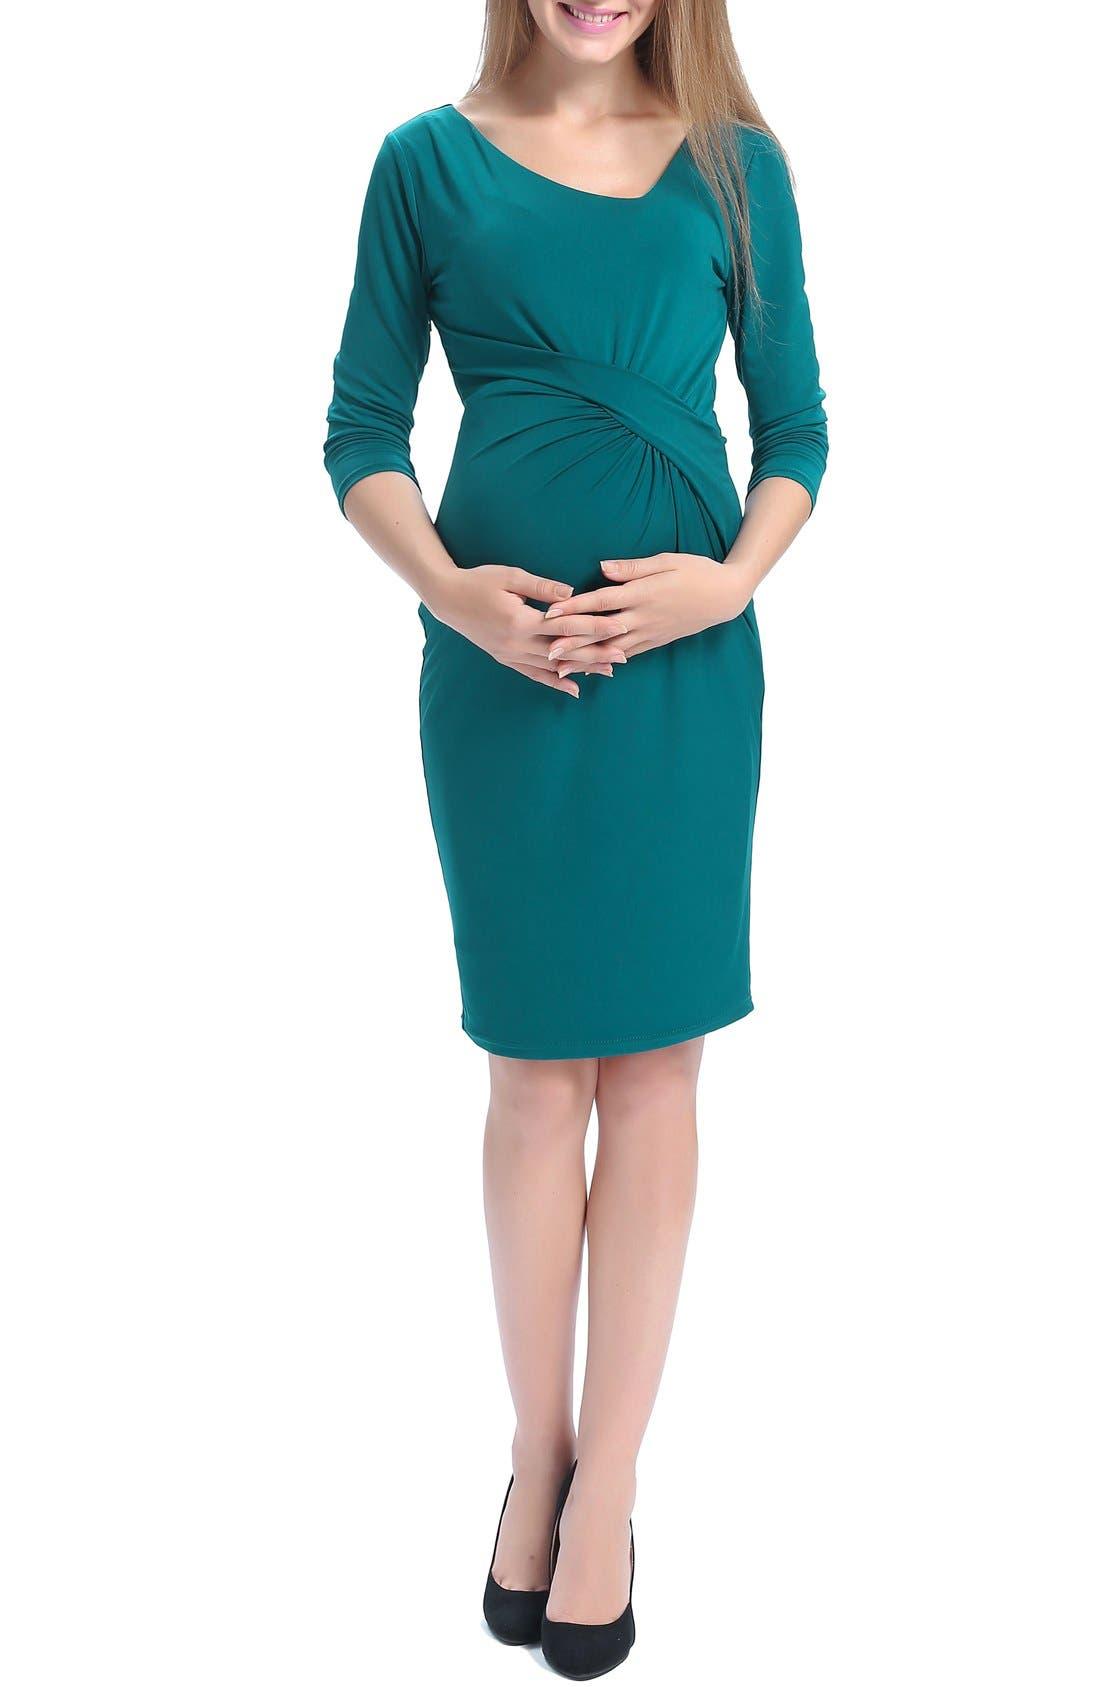 Teagan Body-Con Maternity Dress,                             Main thumbnail 1, color,                             TEAL